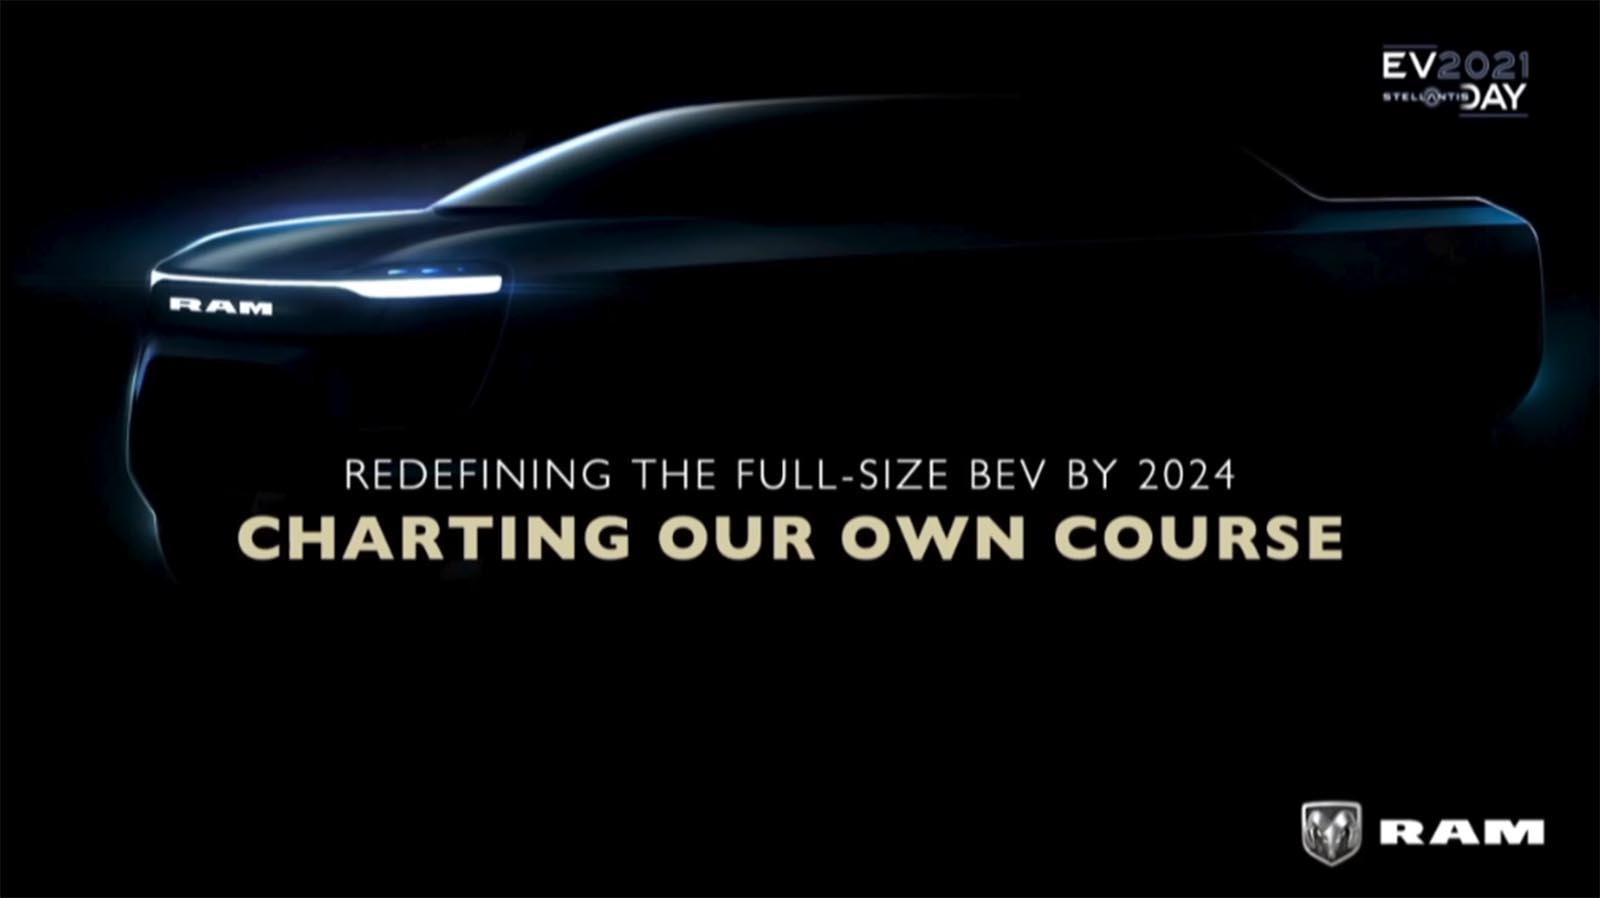 Ram 1500 EV teaser